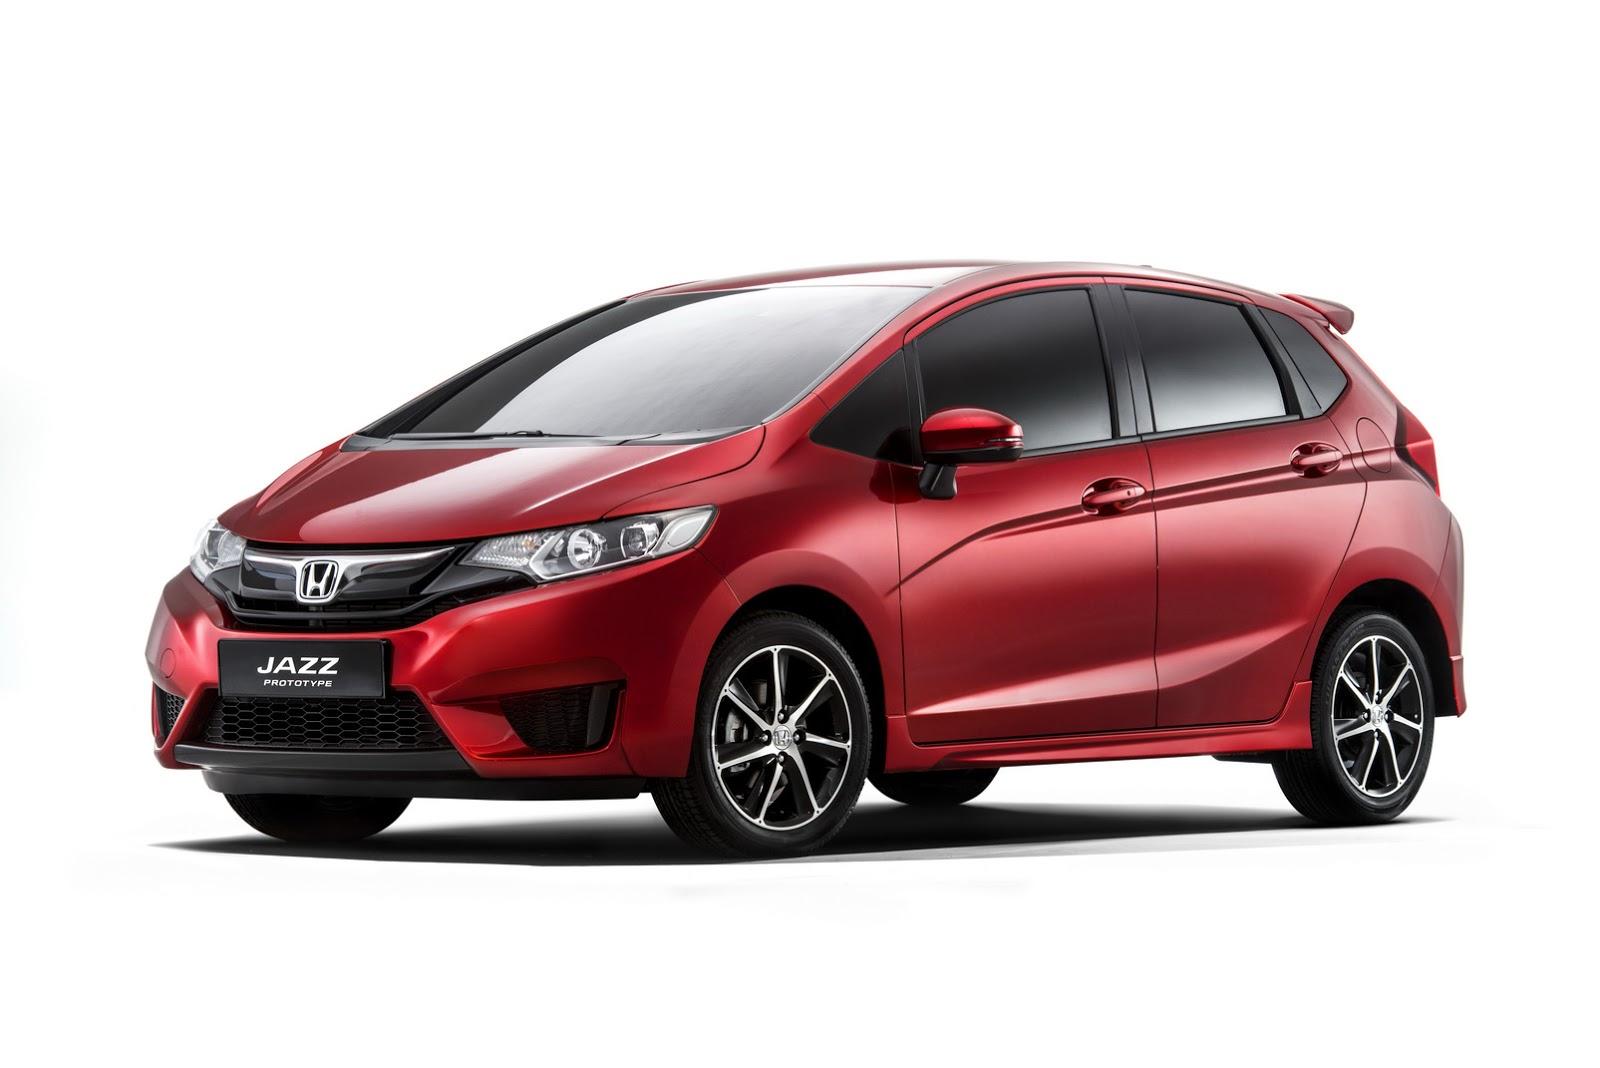 Kelemahan New Yaris Trd Sportivo Cara Reset Ecu Grand Avanza Herwono Banyu Alas 9 Honda All Jazz Versi Pengguna